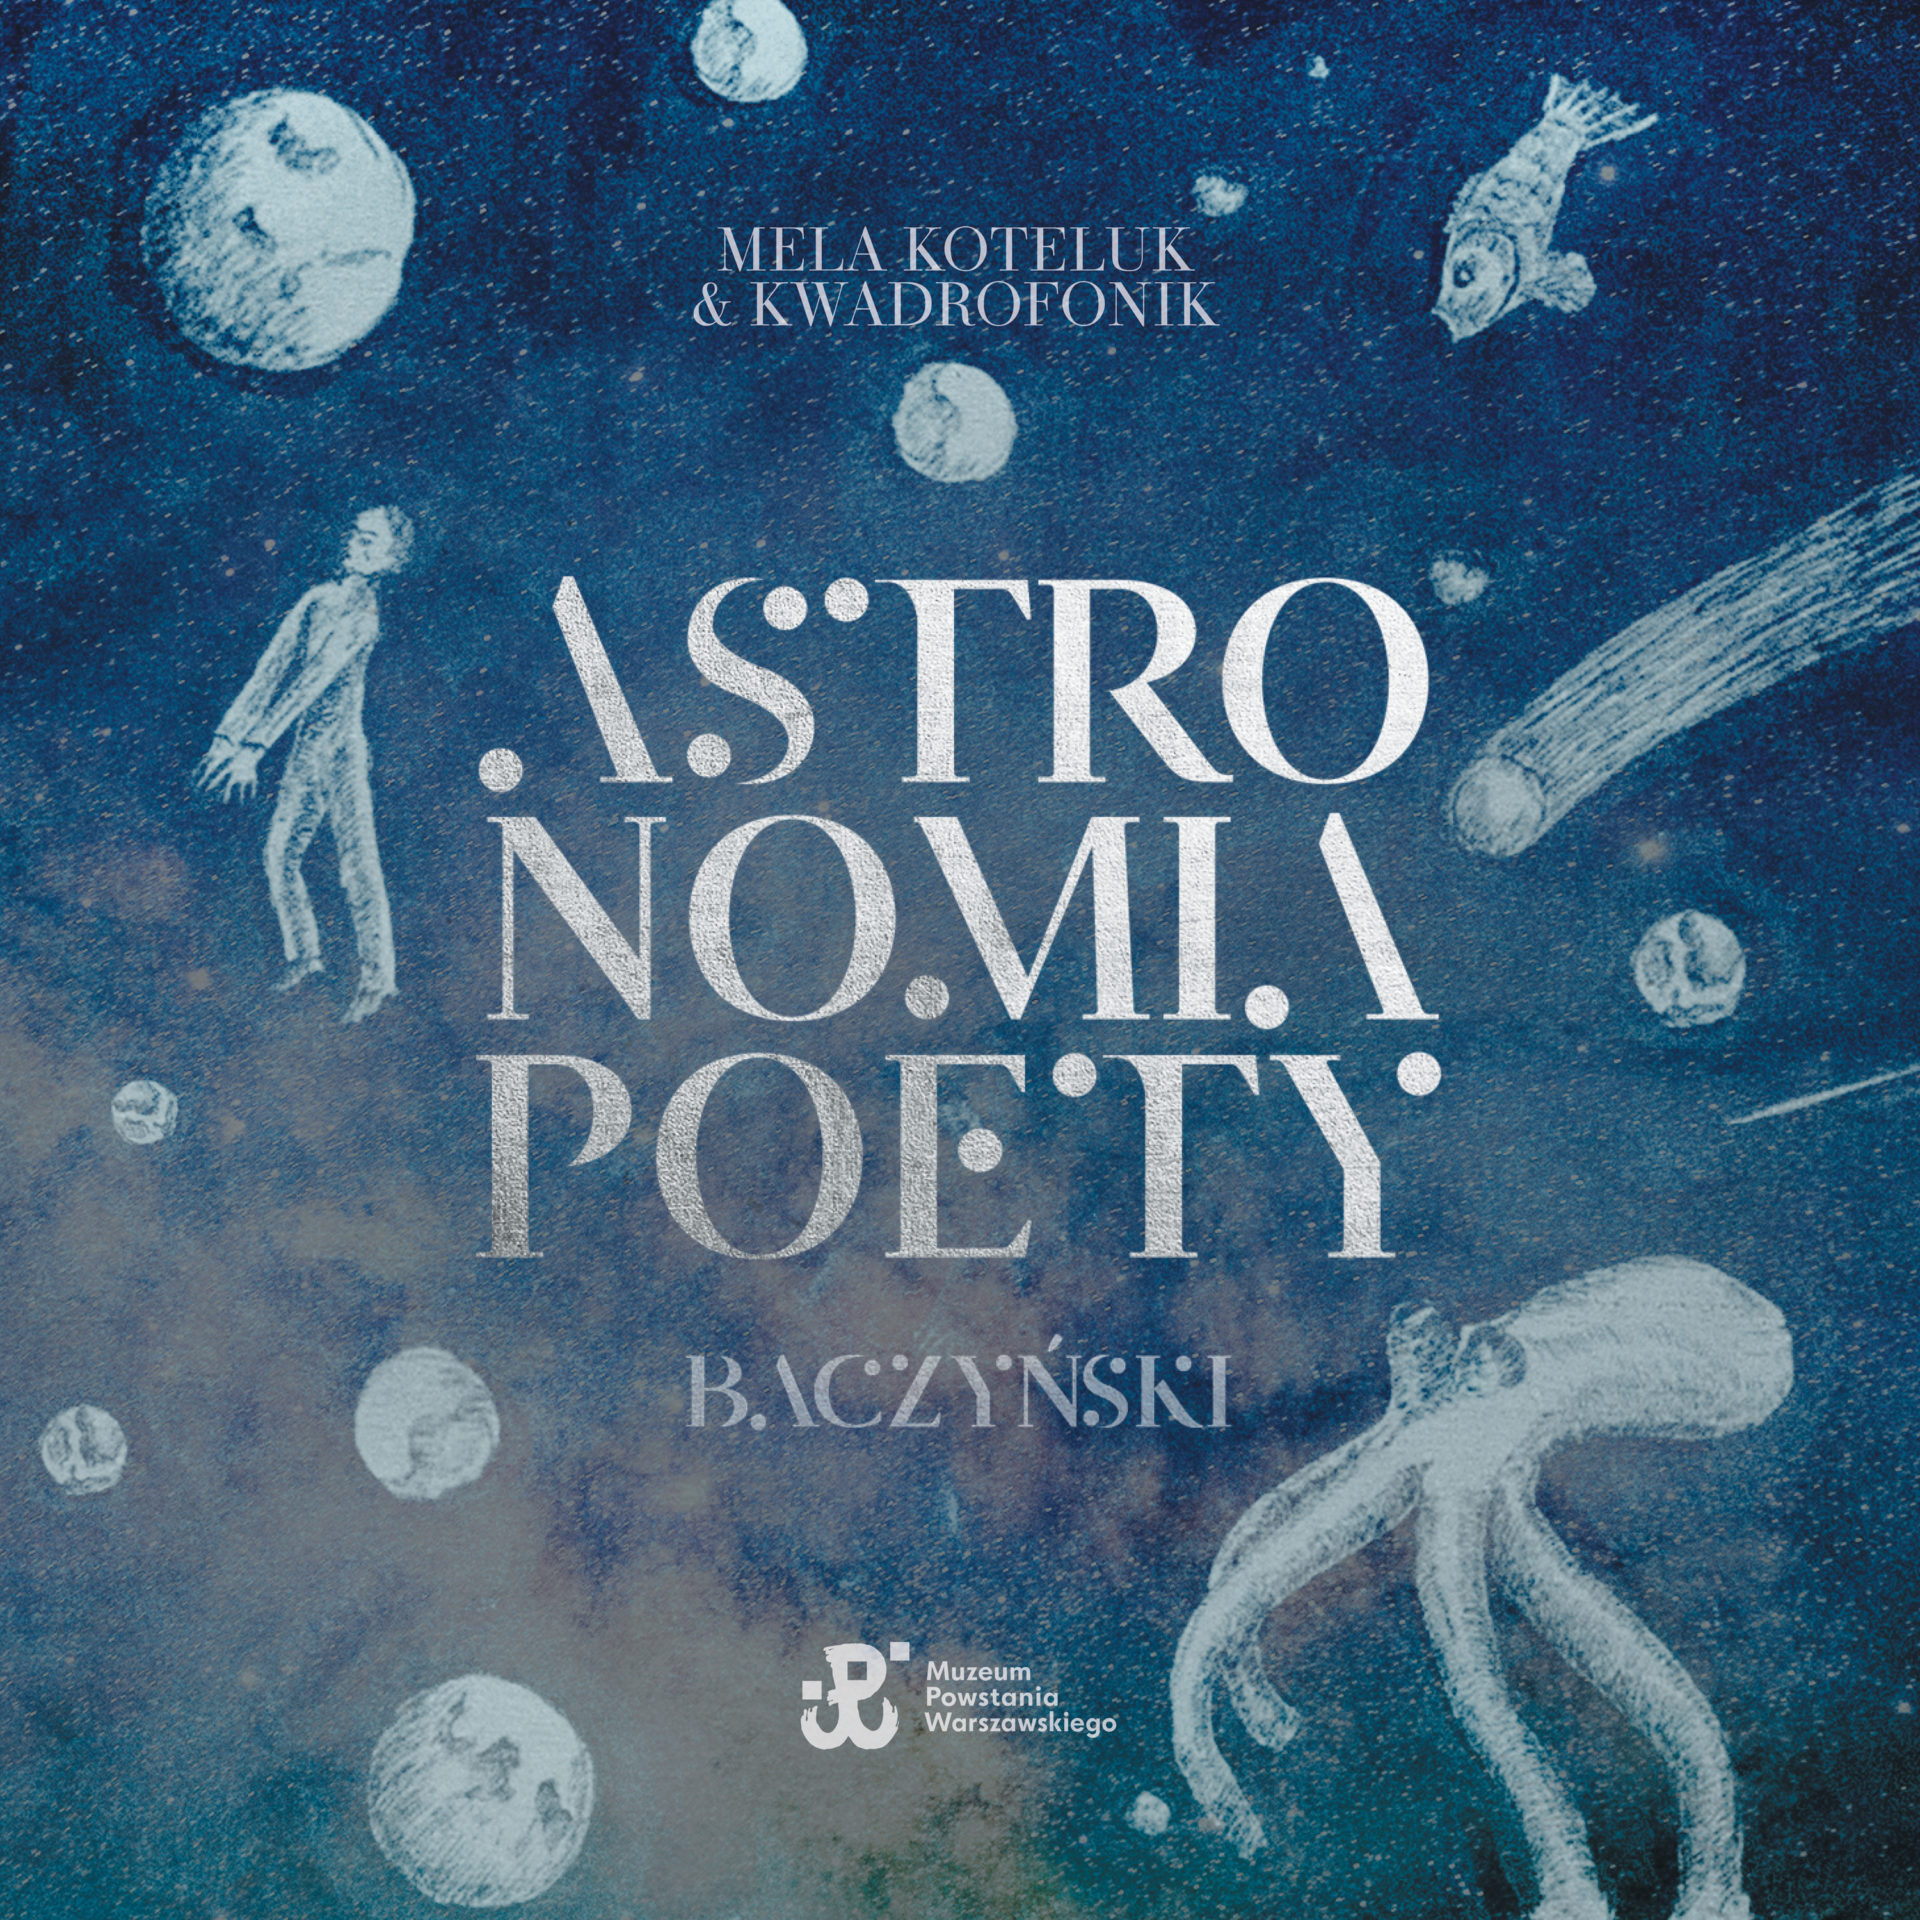 Mela Koteluk Kwadrofonik - Astronomia poety. Baczyński